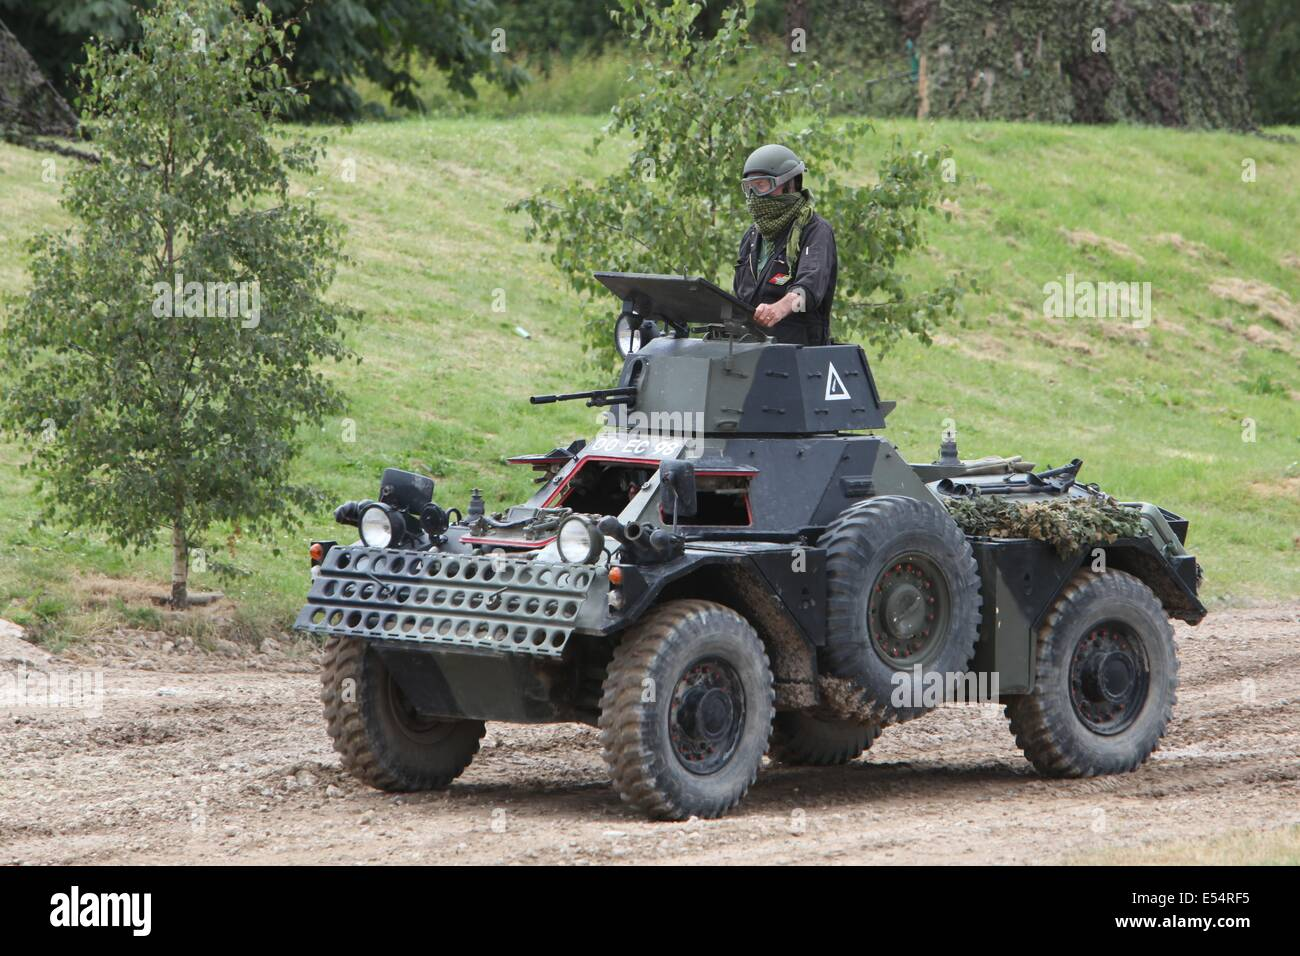 Ferret MkII Scout Car - bovington - Stock Image